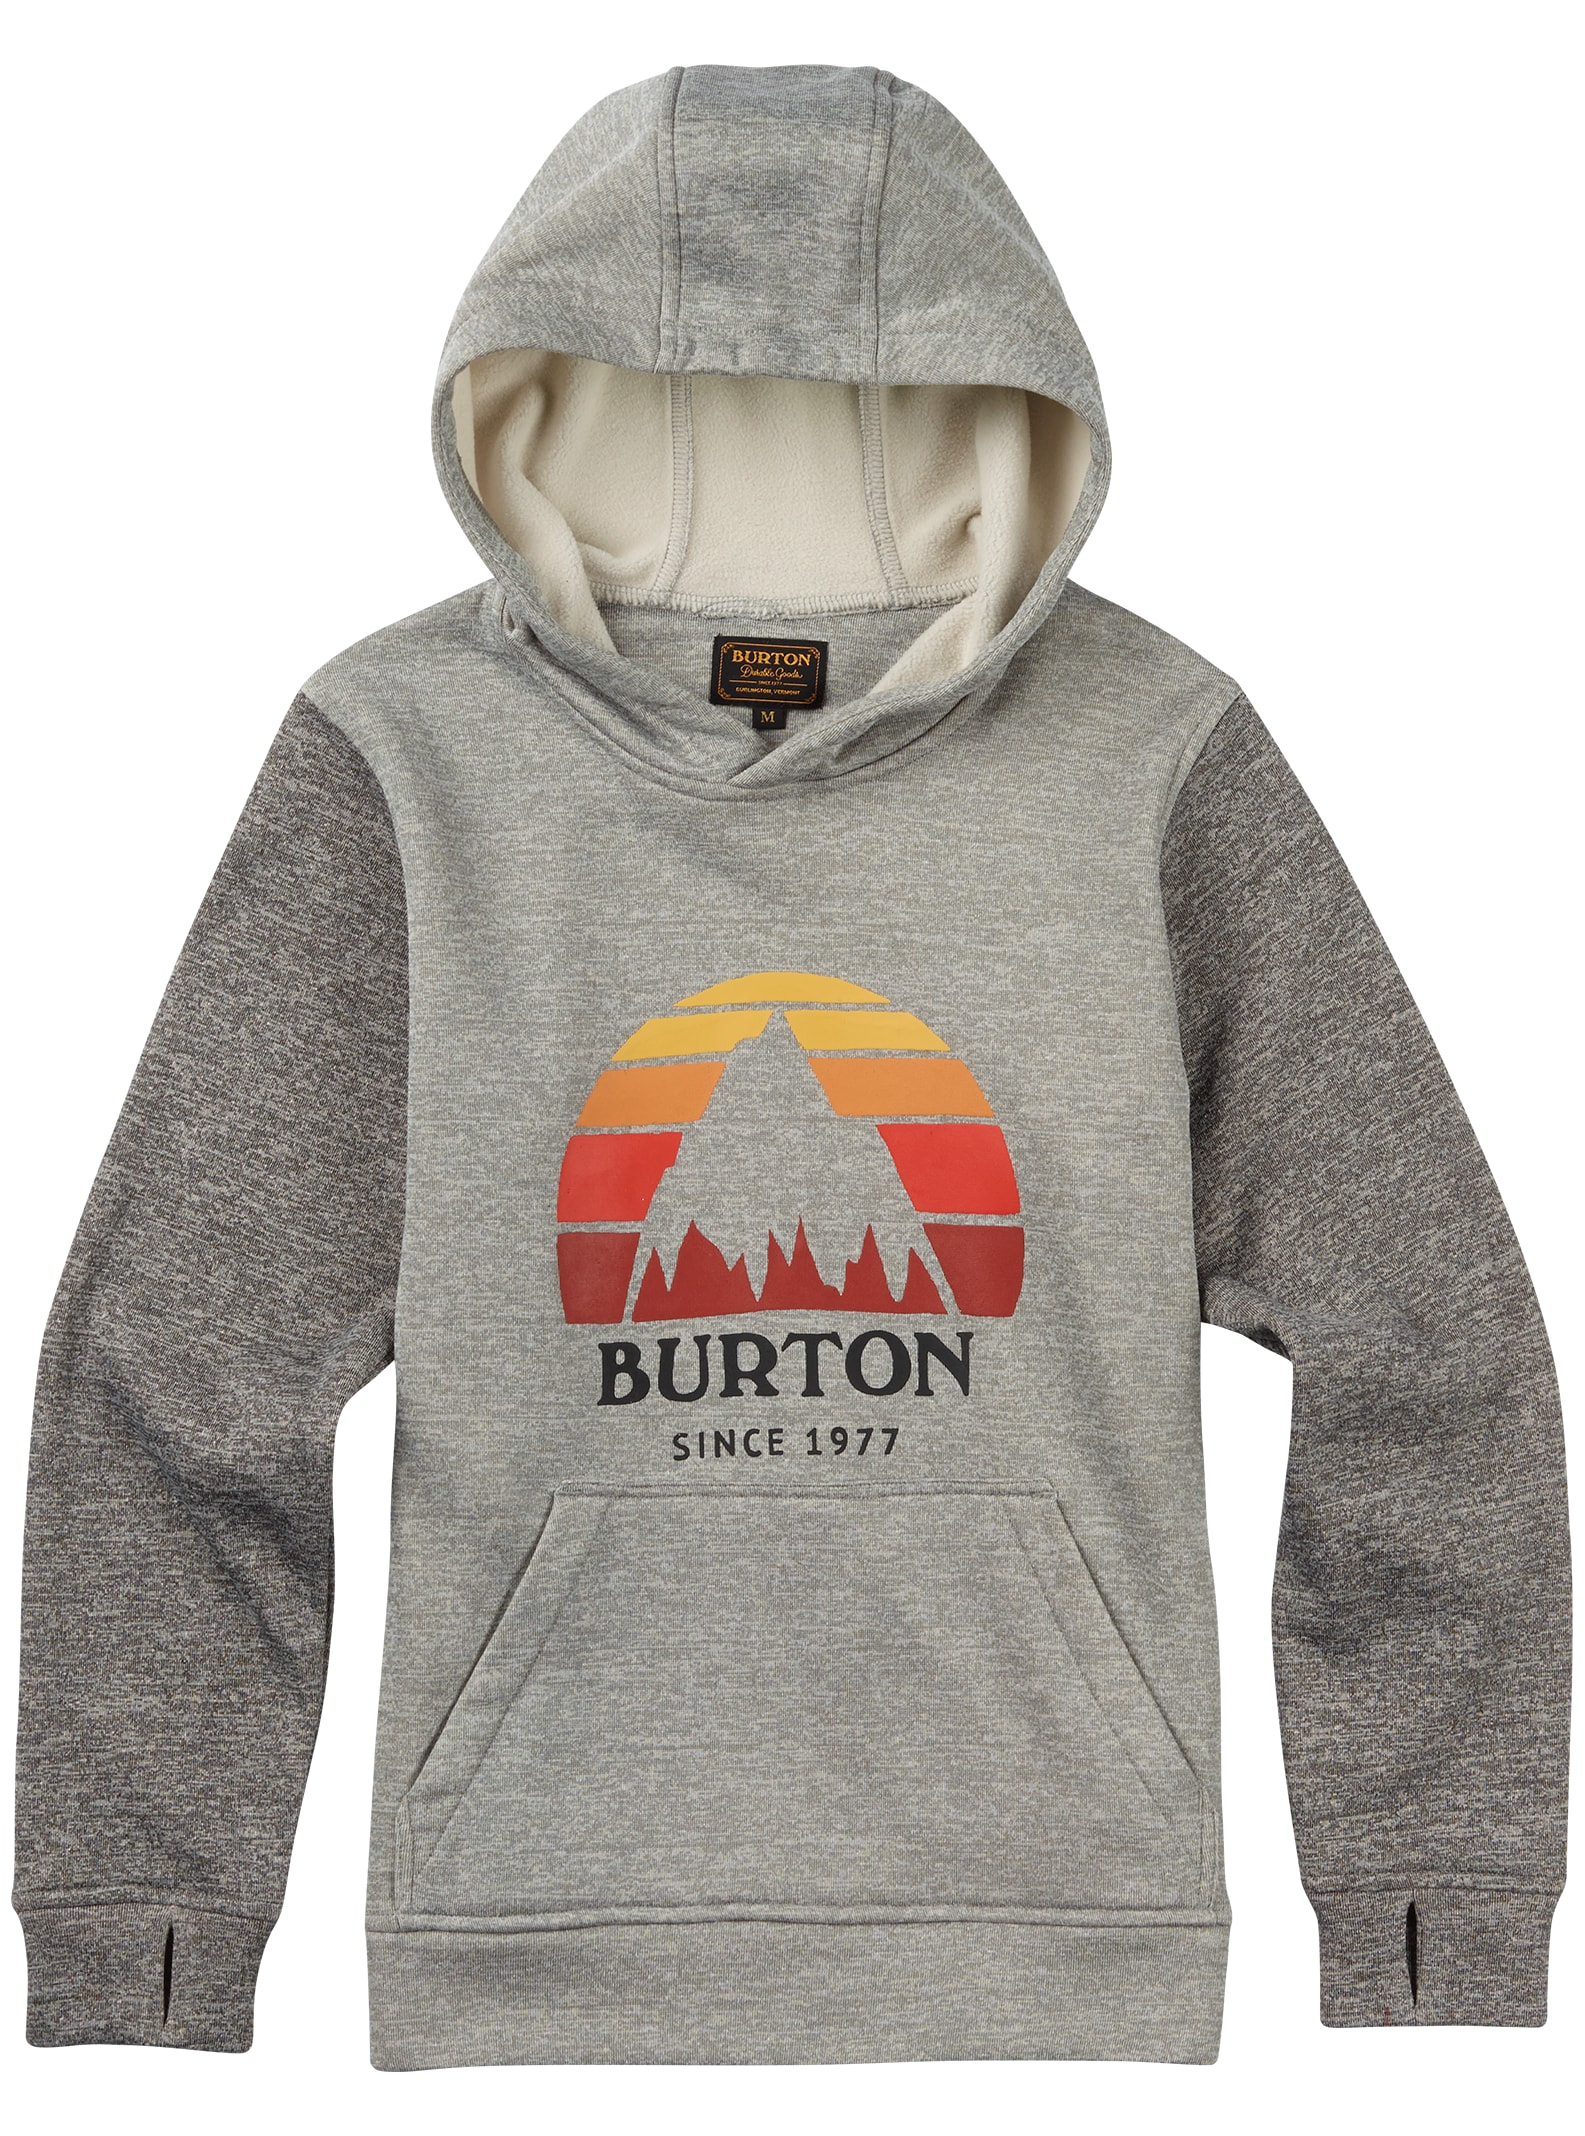 Burton Boys' Oak Pullover Hoodie shown in Monument Heather / True Black